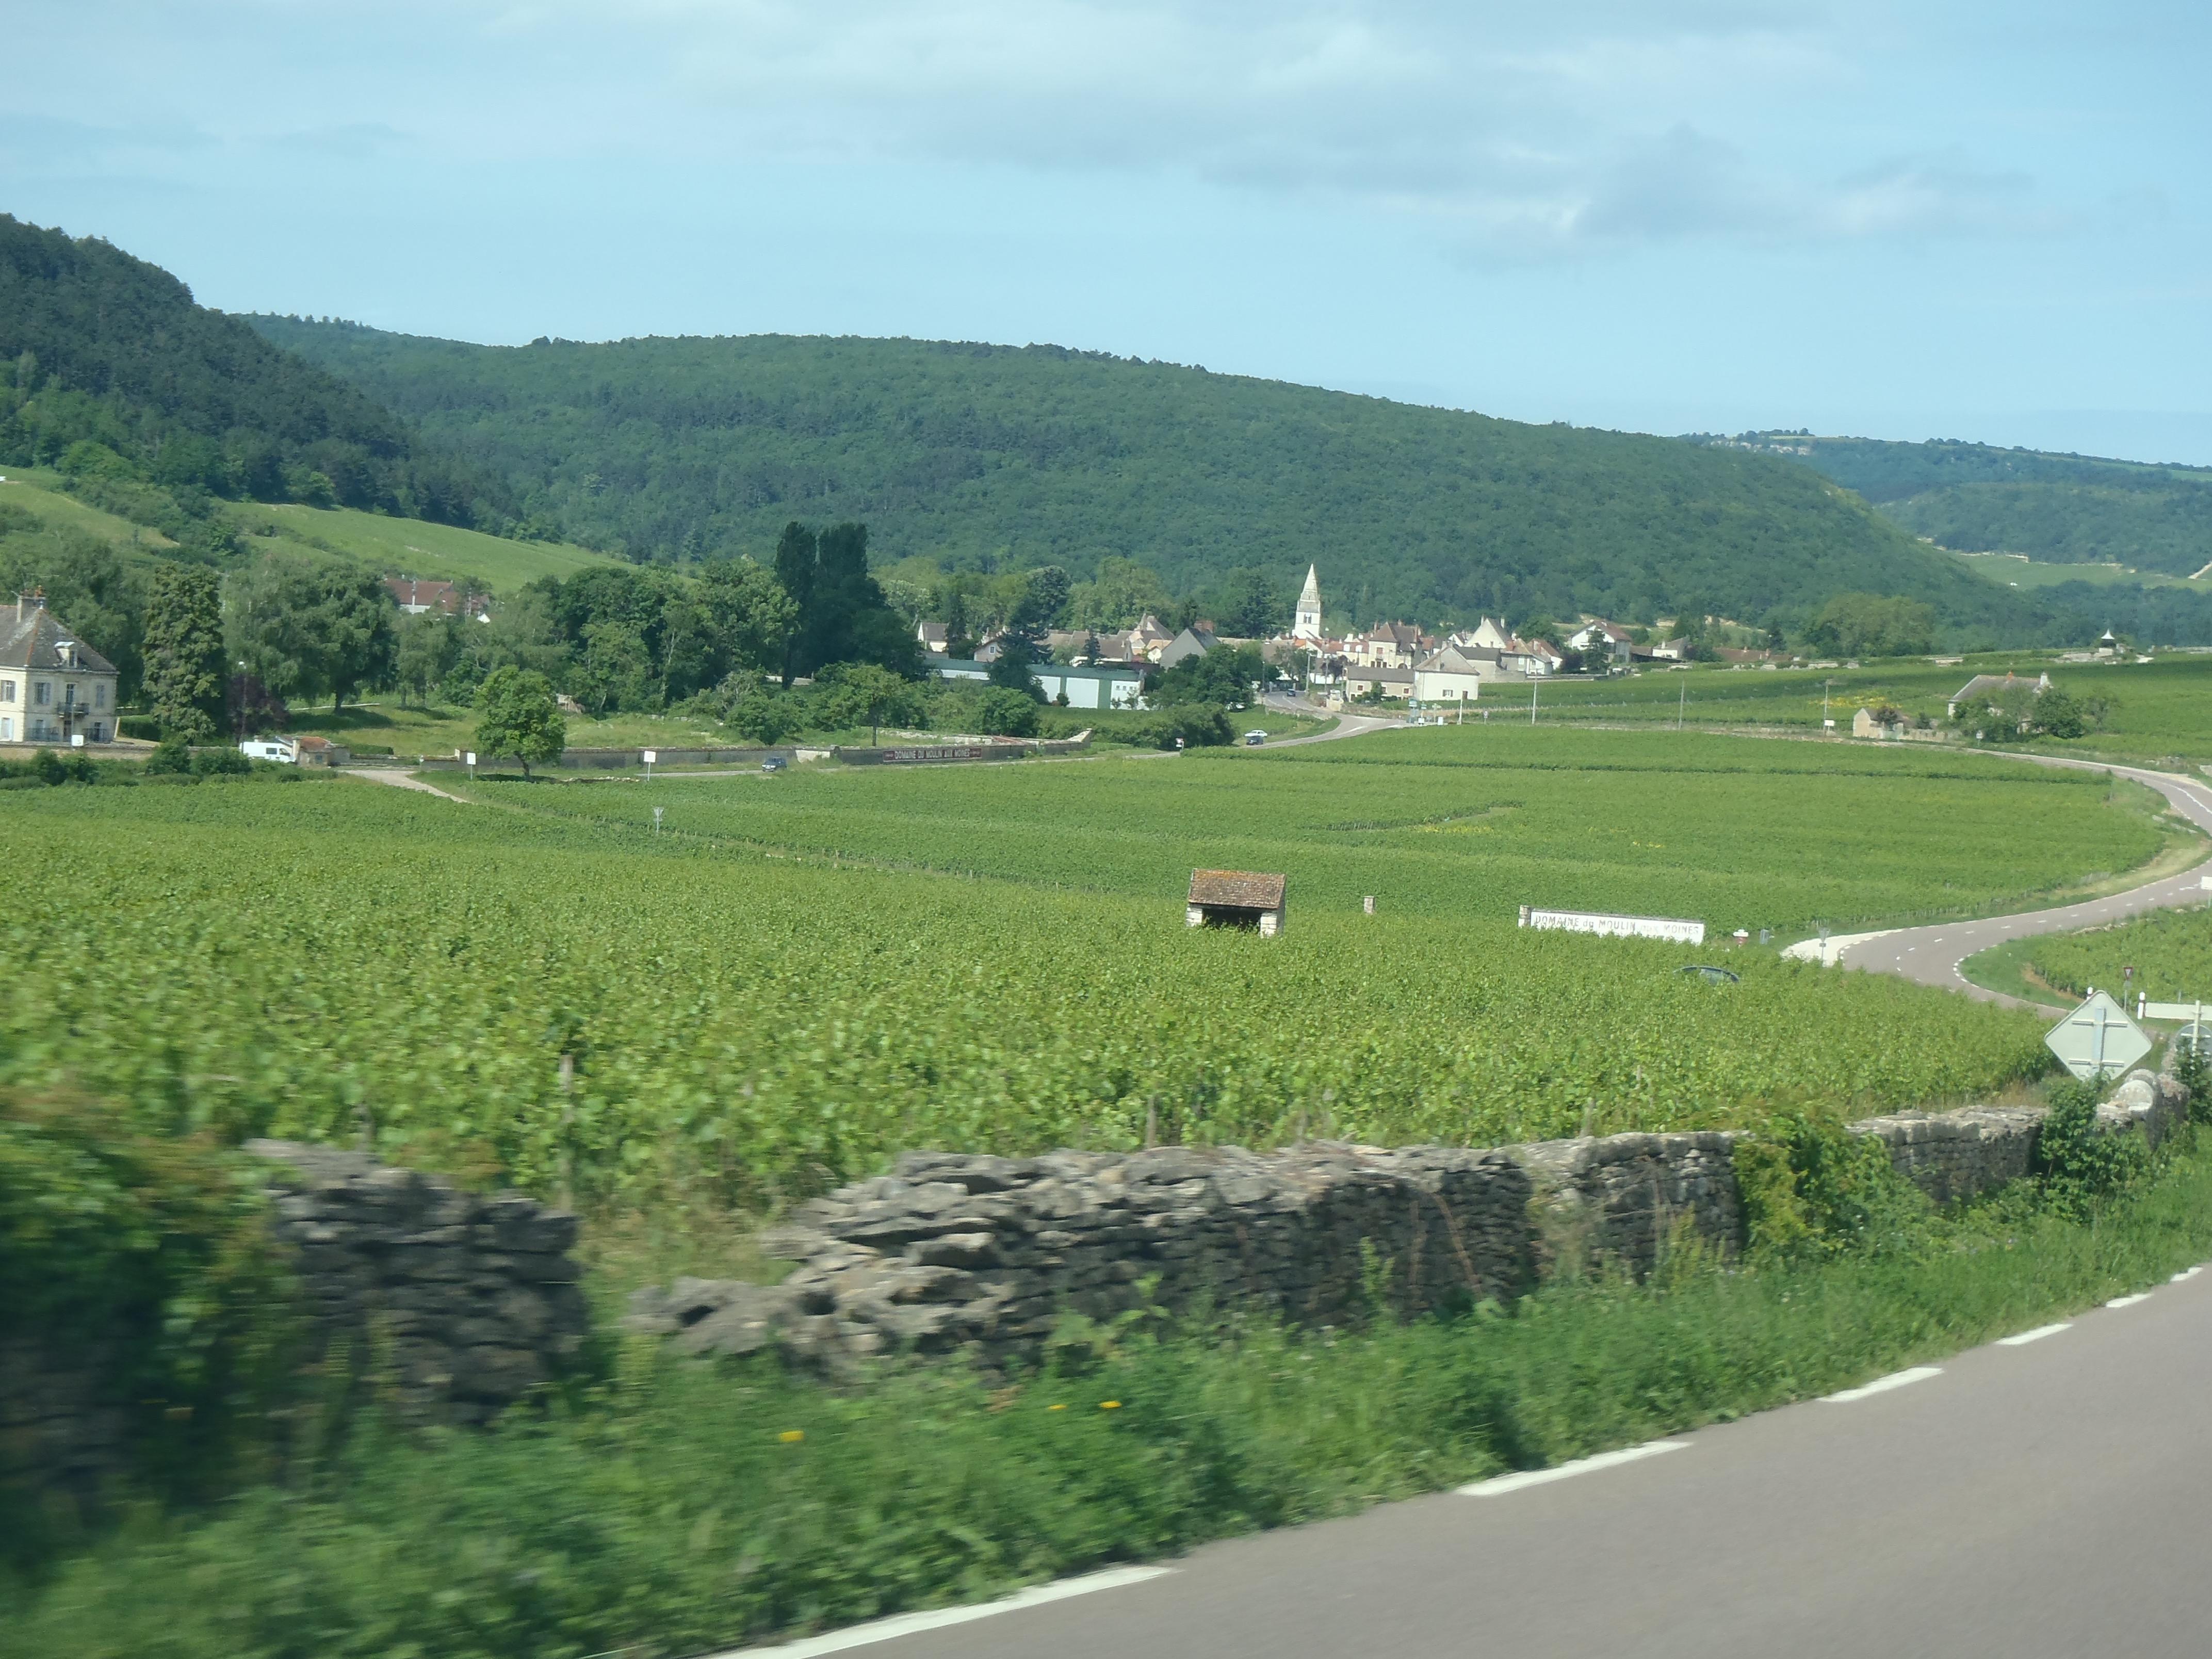 Bourgogne incl. Chablis